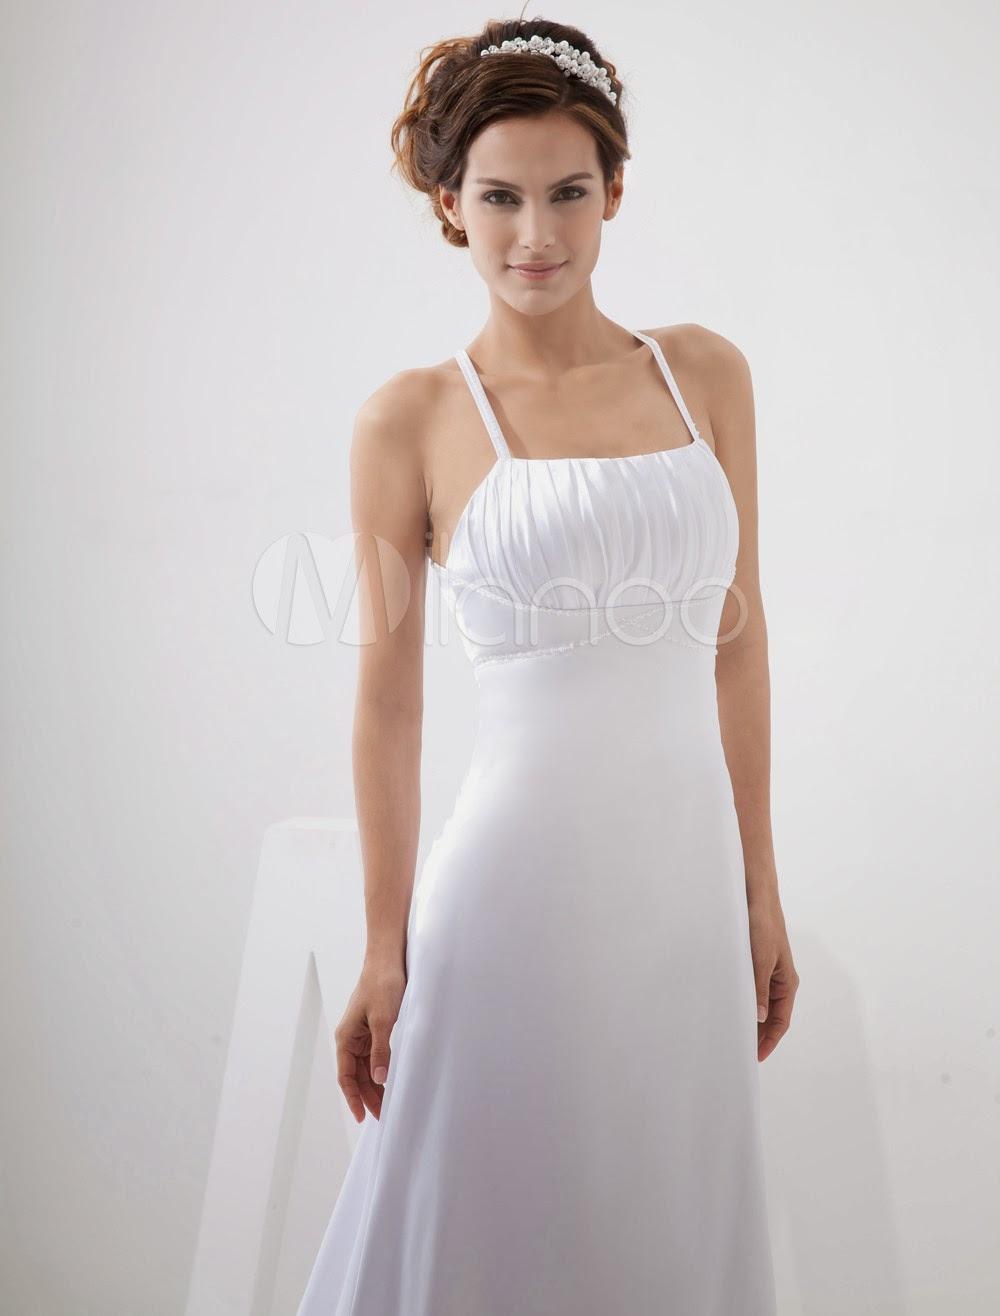 China Wholesale Dresses - A-line Spaghetti Empire Waist Beading Elastic Woven Satin Pongee Wedding Dress